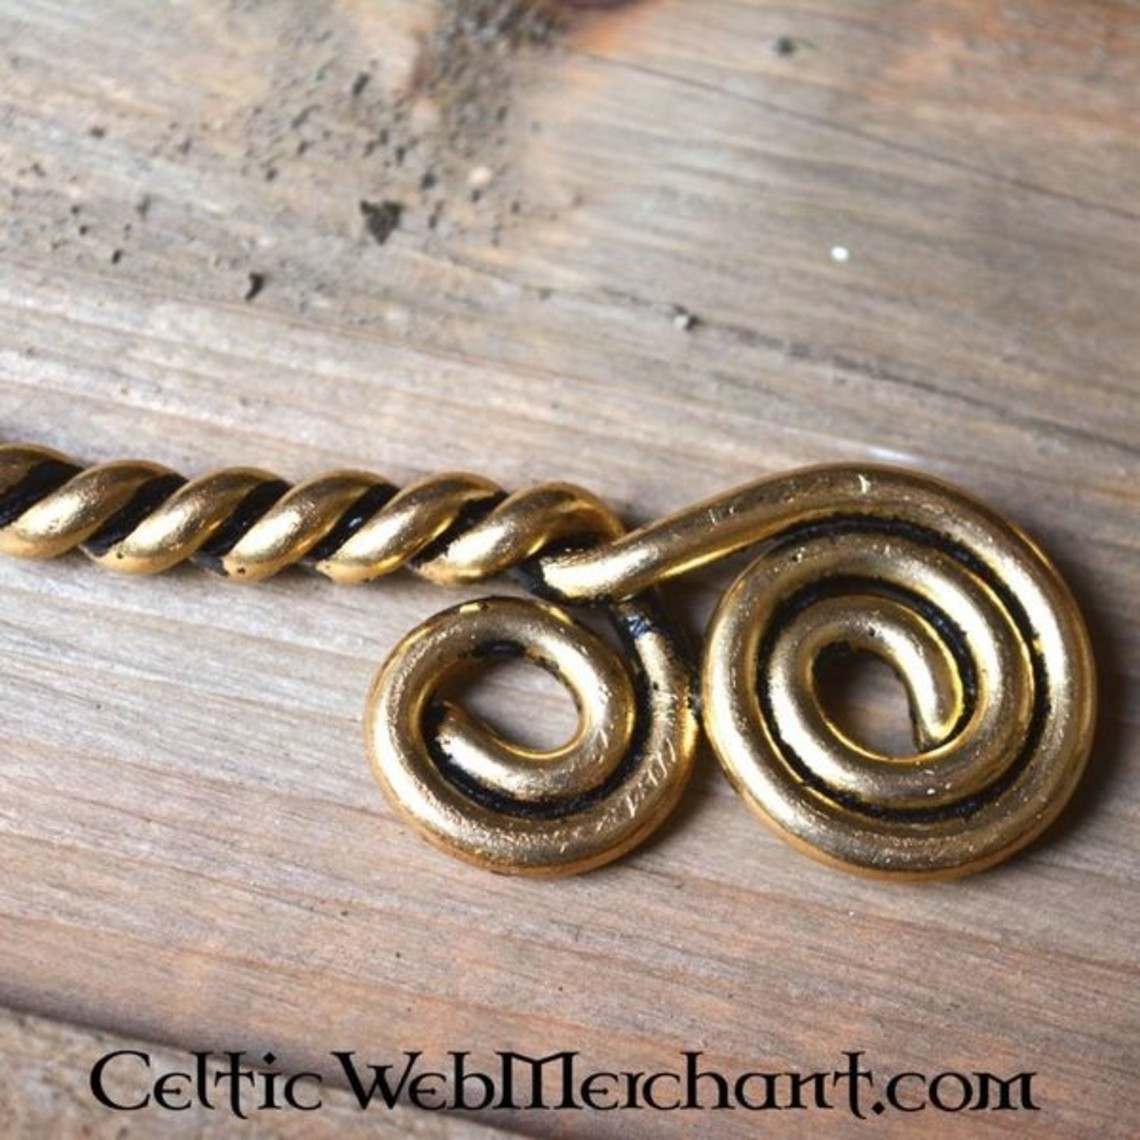 Moment z celtyckich spirale, posrebrzane